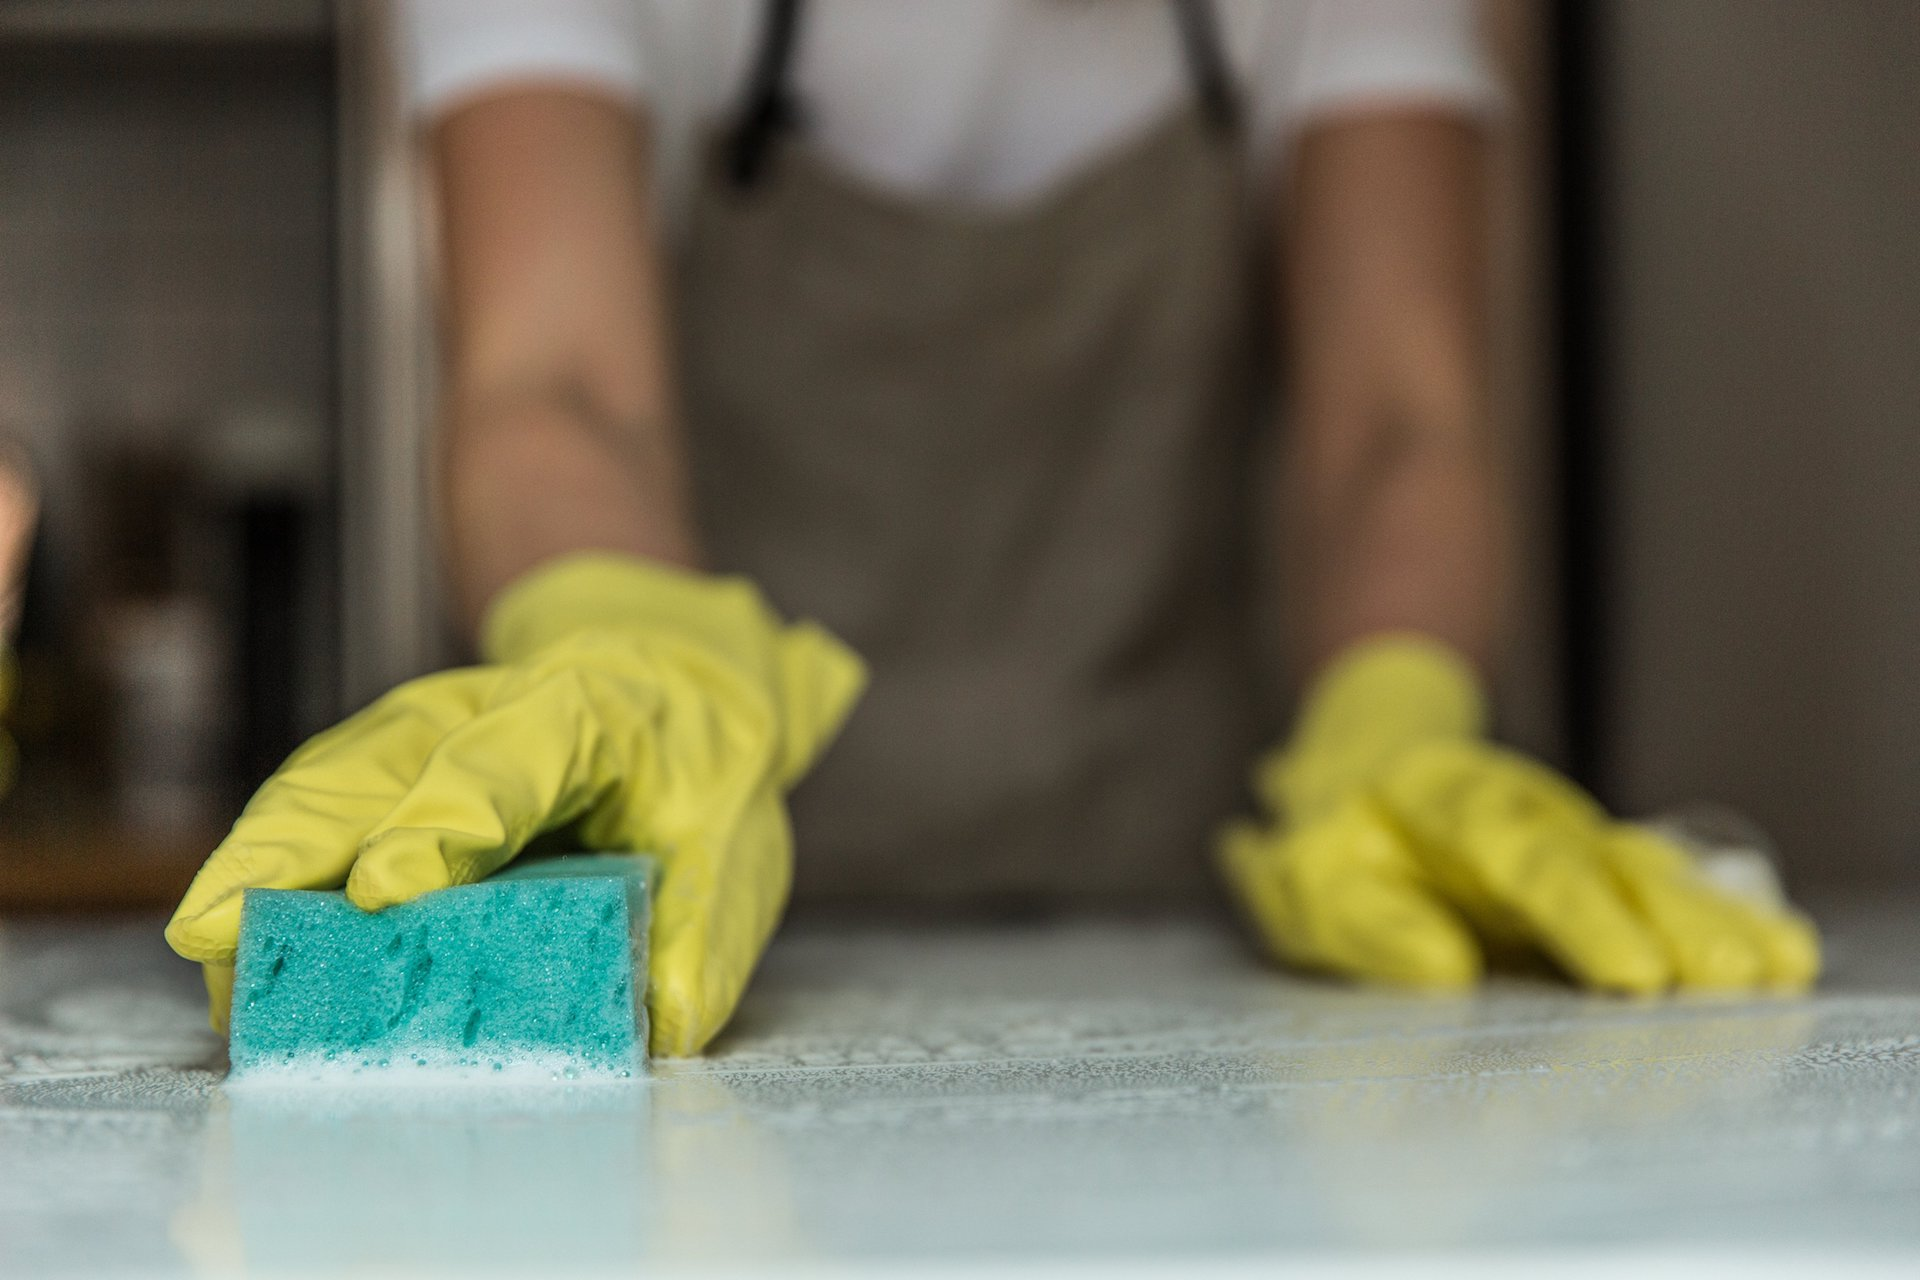 man-wiping-countertop_new-home-checklist.jpg